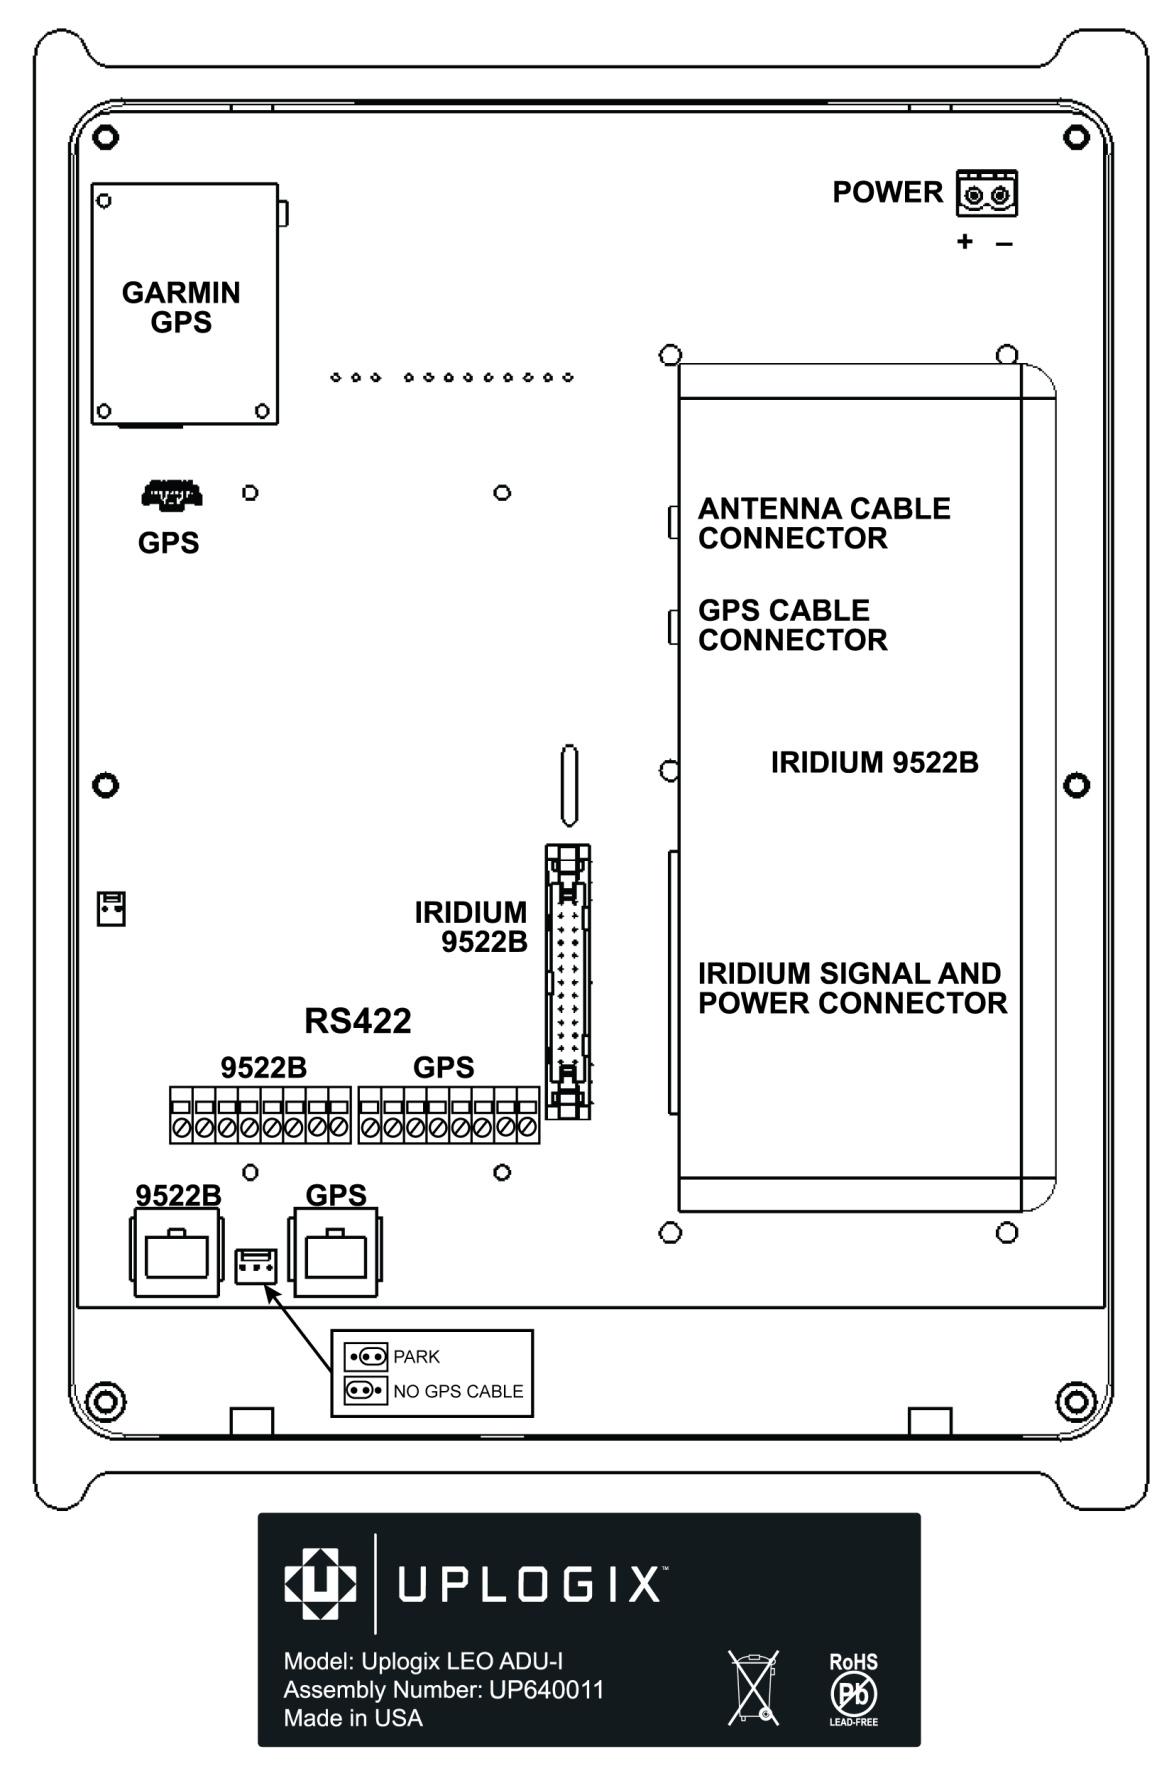 image001?resize=665%2C1006 garmin 440s wiring diagram garmin gpsmap schematic diagrams Outdoor GPS Antenna at n-0.co